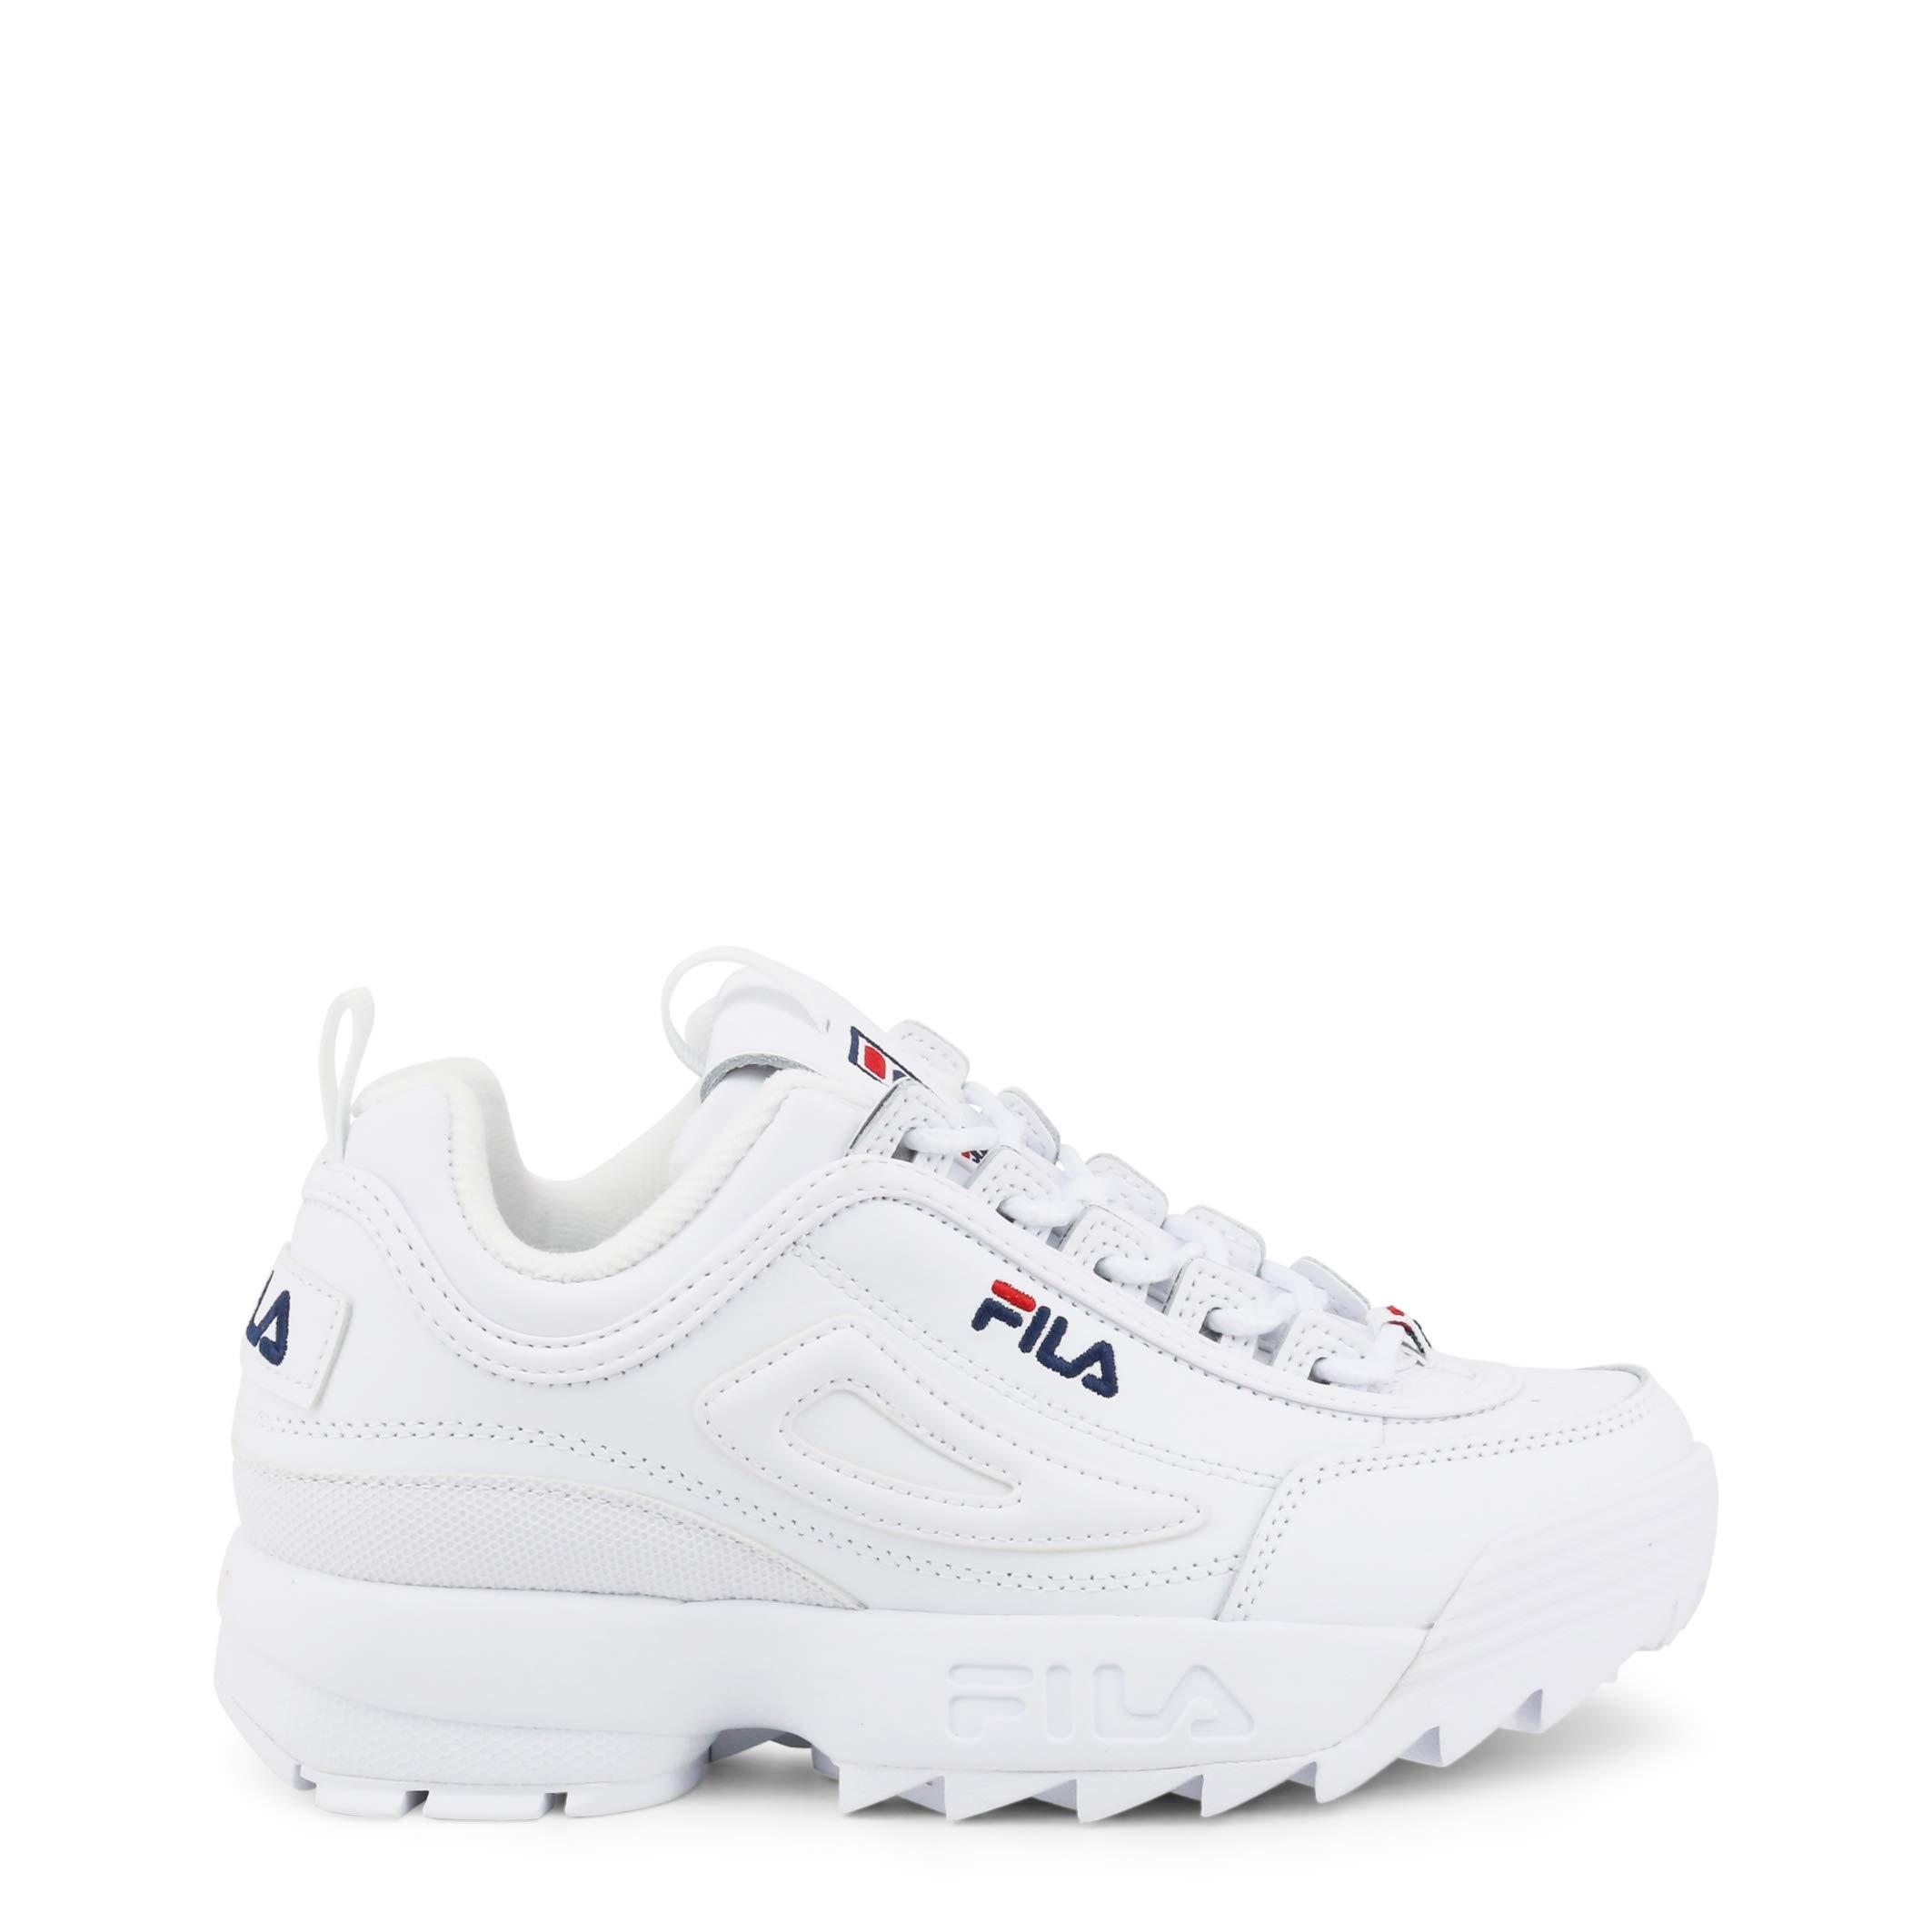 Fila Womens Disruptor II Premium Sneaker, Adult, White/Navy/Red, 6 M US by Fila